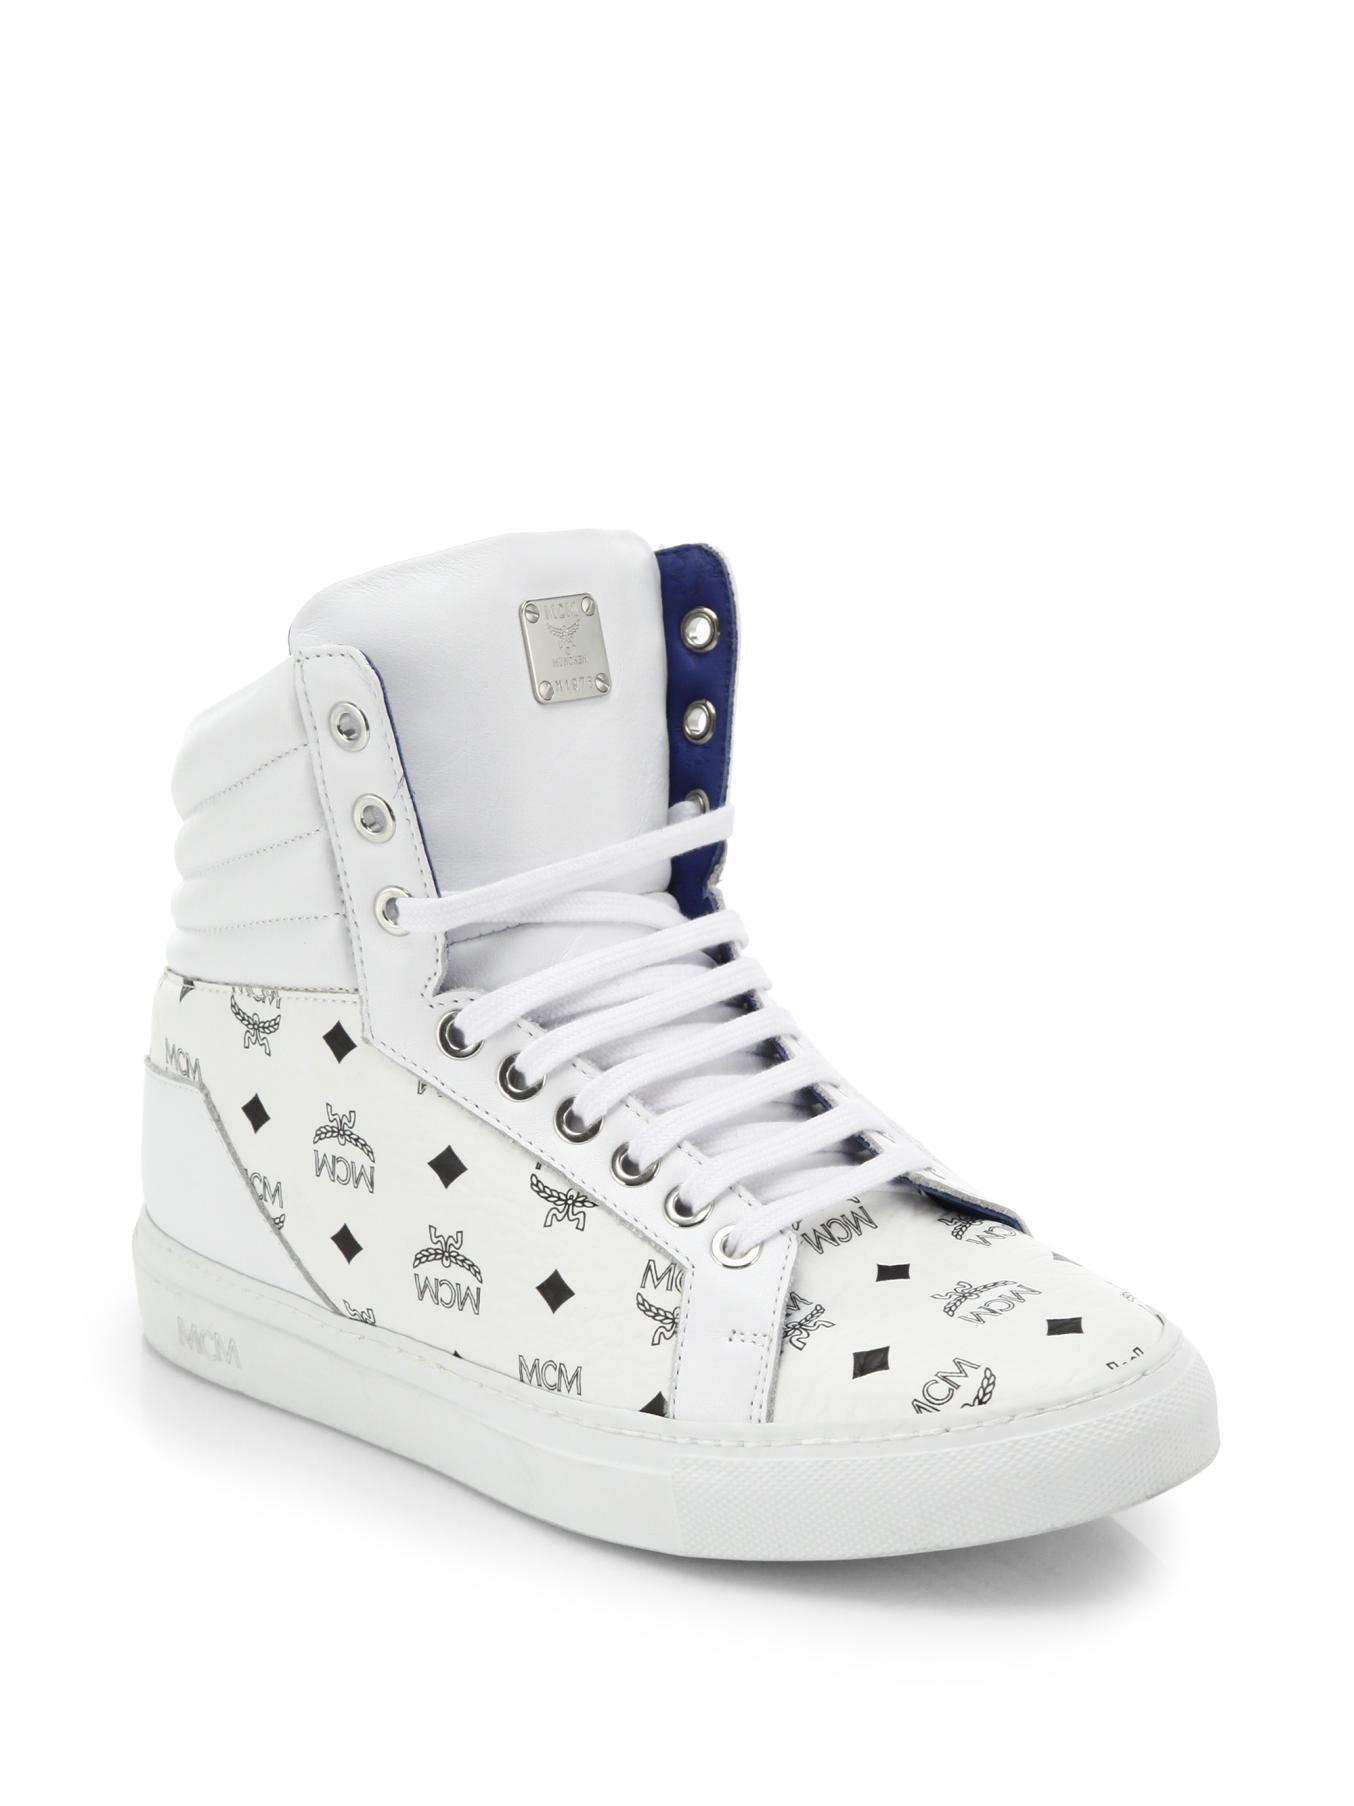 mcm shoes for sale mcm wallet